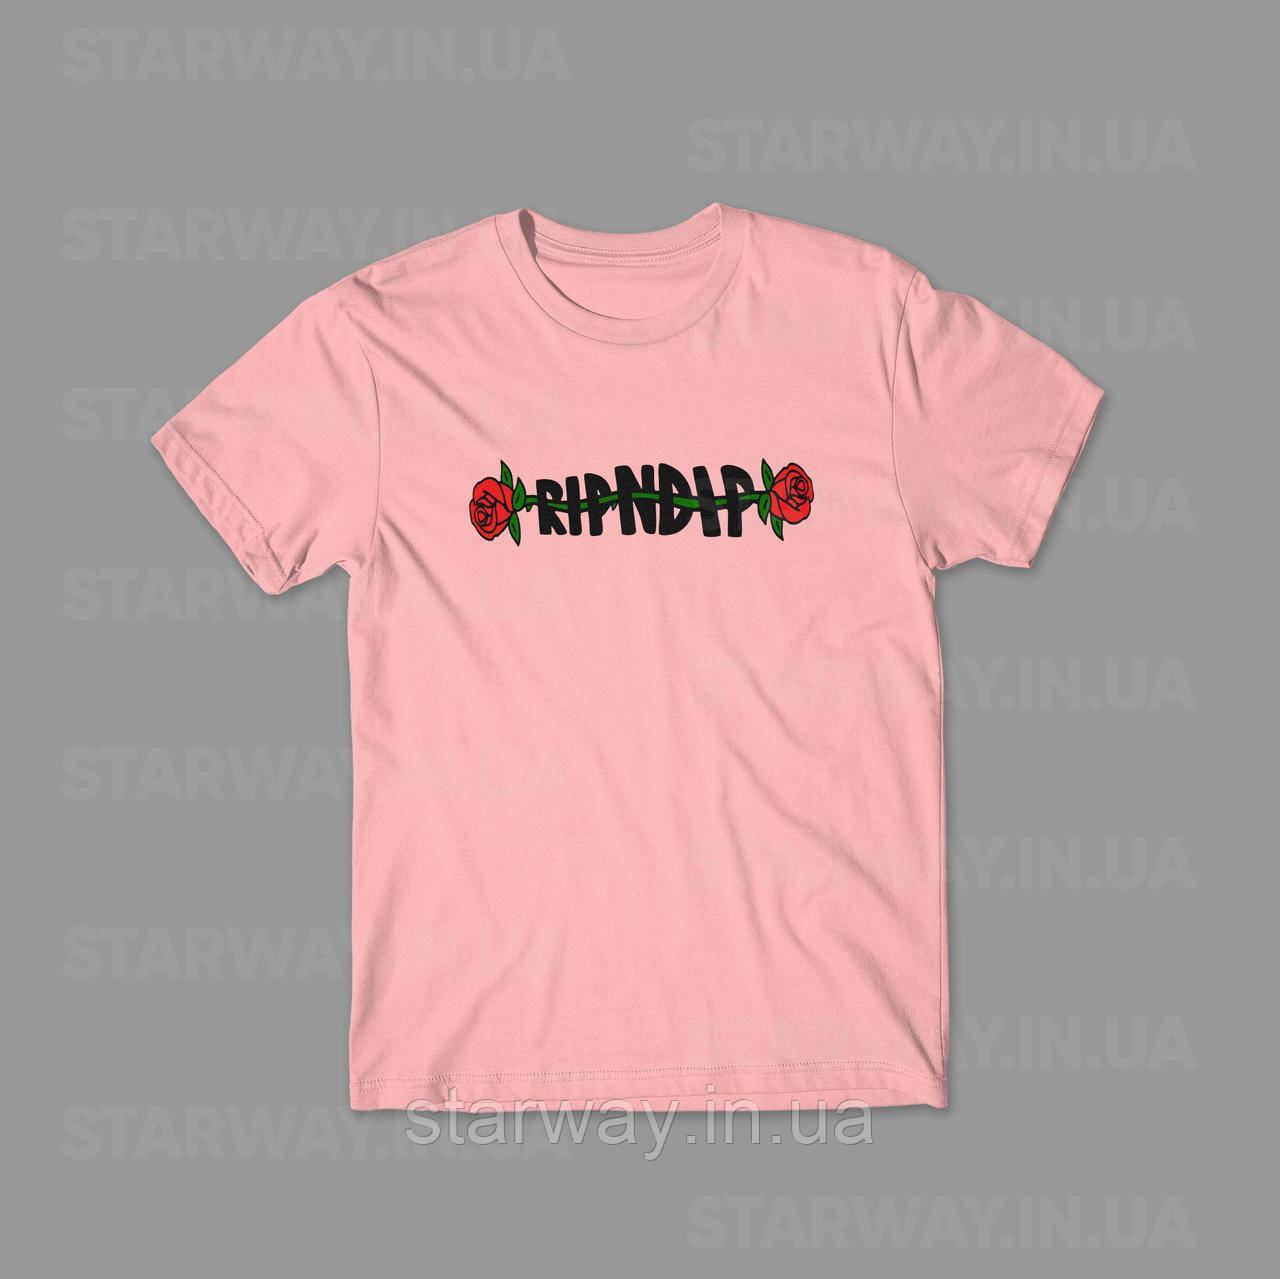 Футболка розовая RipNDip Rose logo